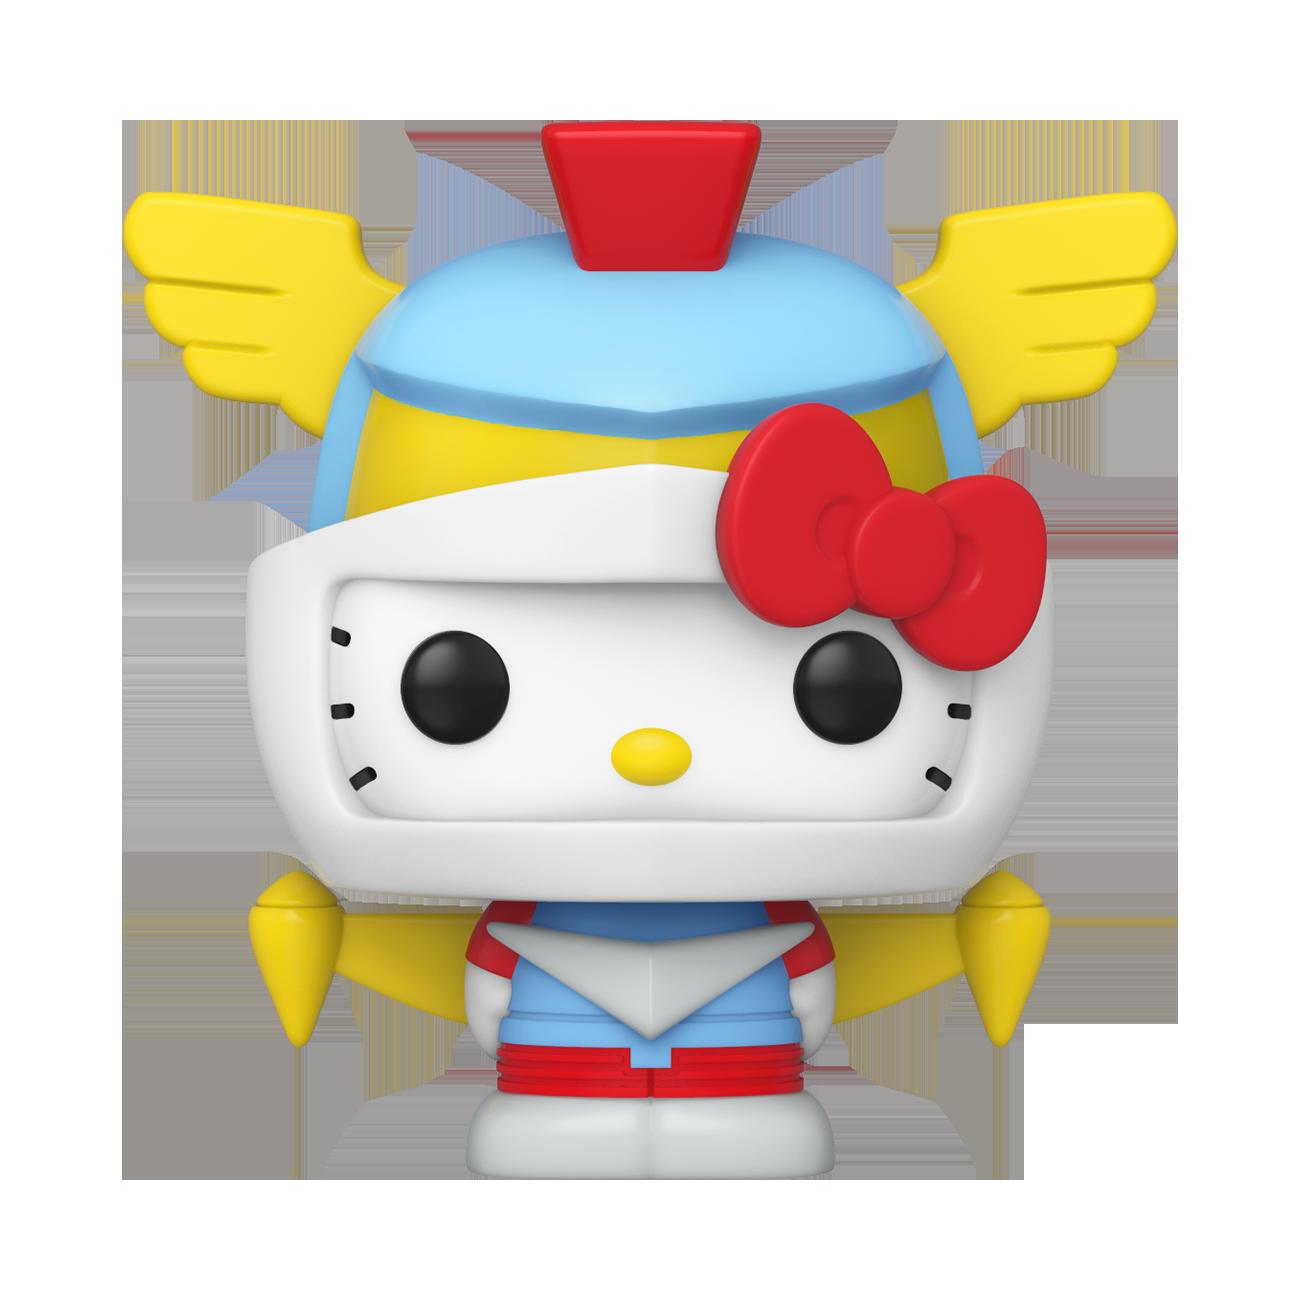 Funko Sanrio Hello Kitty Robot Summer Convention 2020 Exclusive Pop! Vinyl Figure